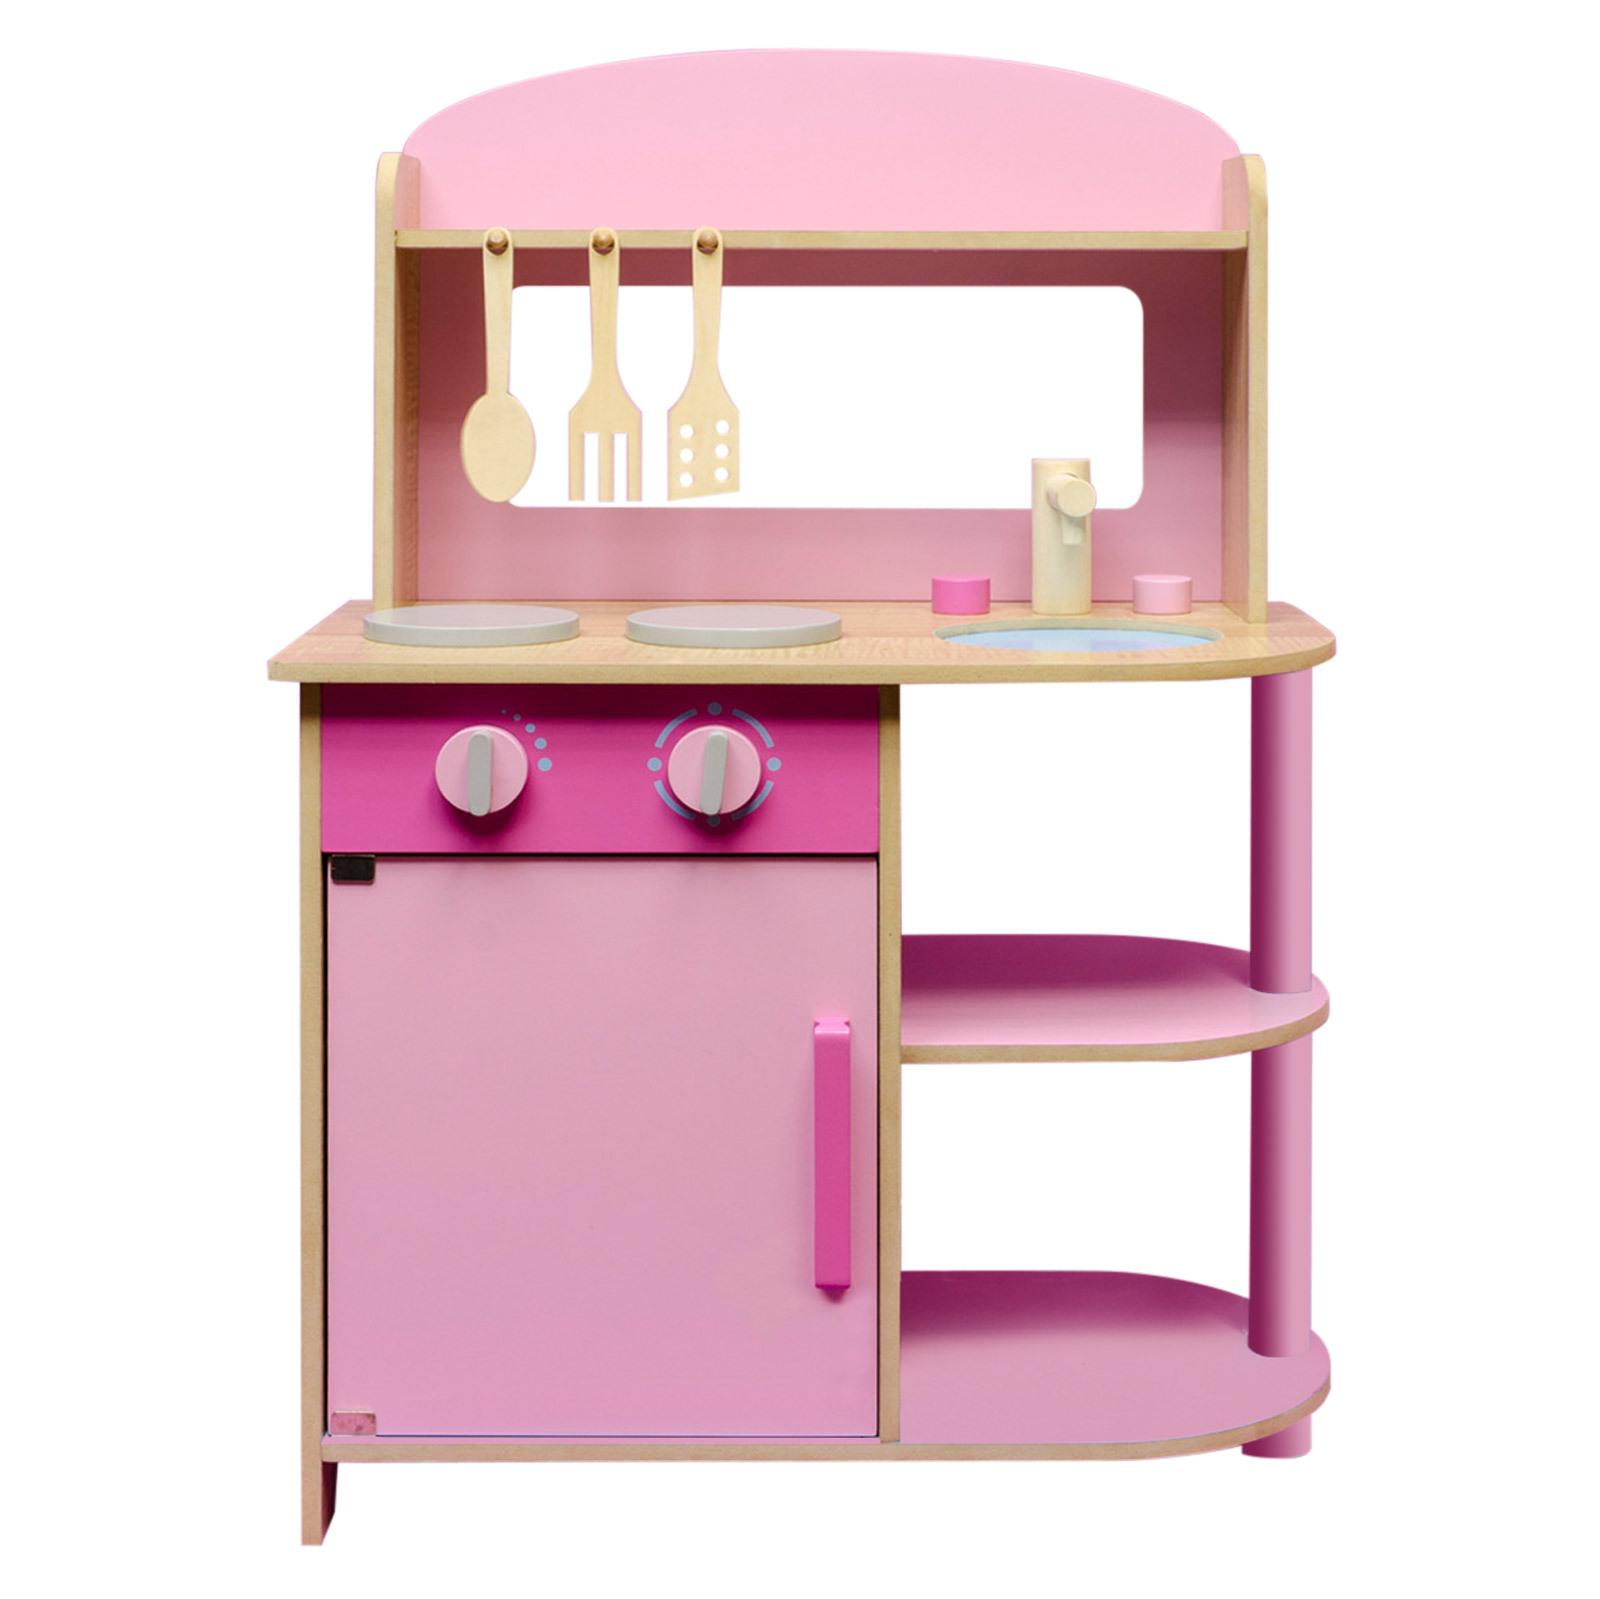 spielk che spielzeugk che kinderk che holzk che kinder k che aus holz rosa pink ebay. Black Bedroom Furniture Sets. Home Design Ideas